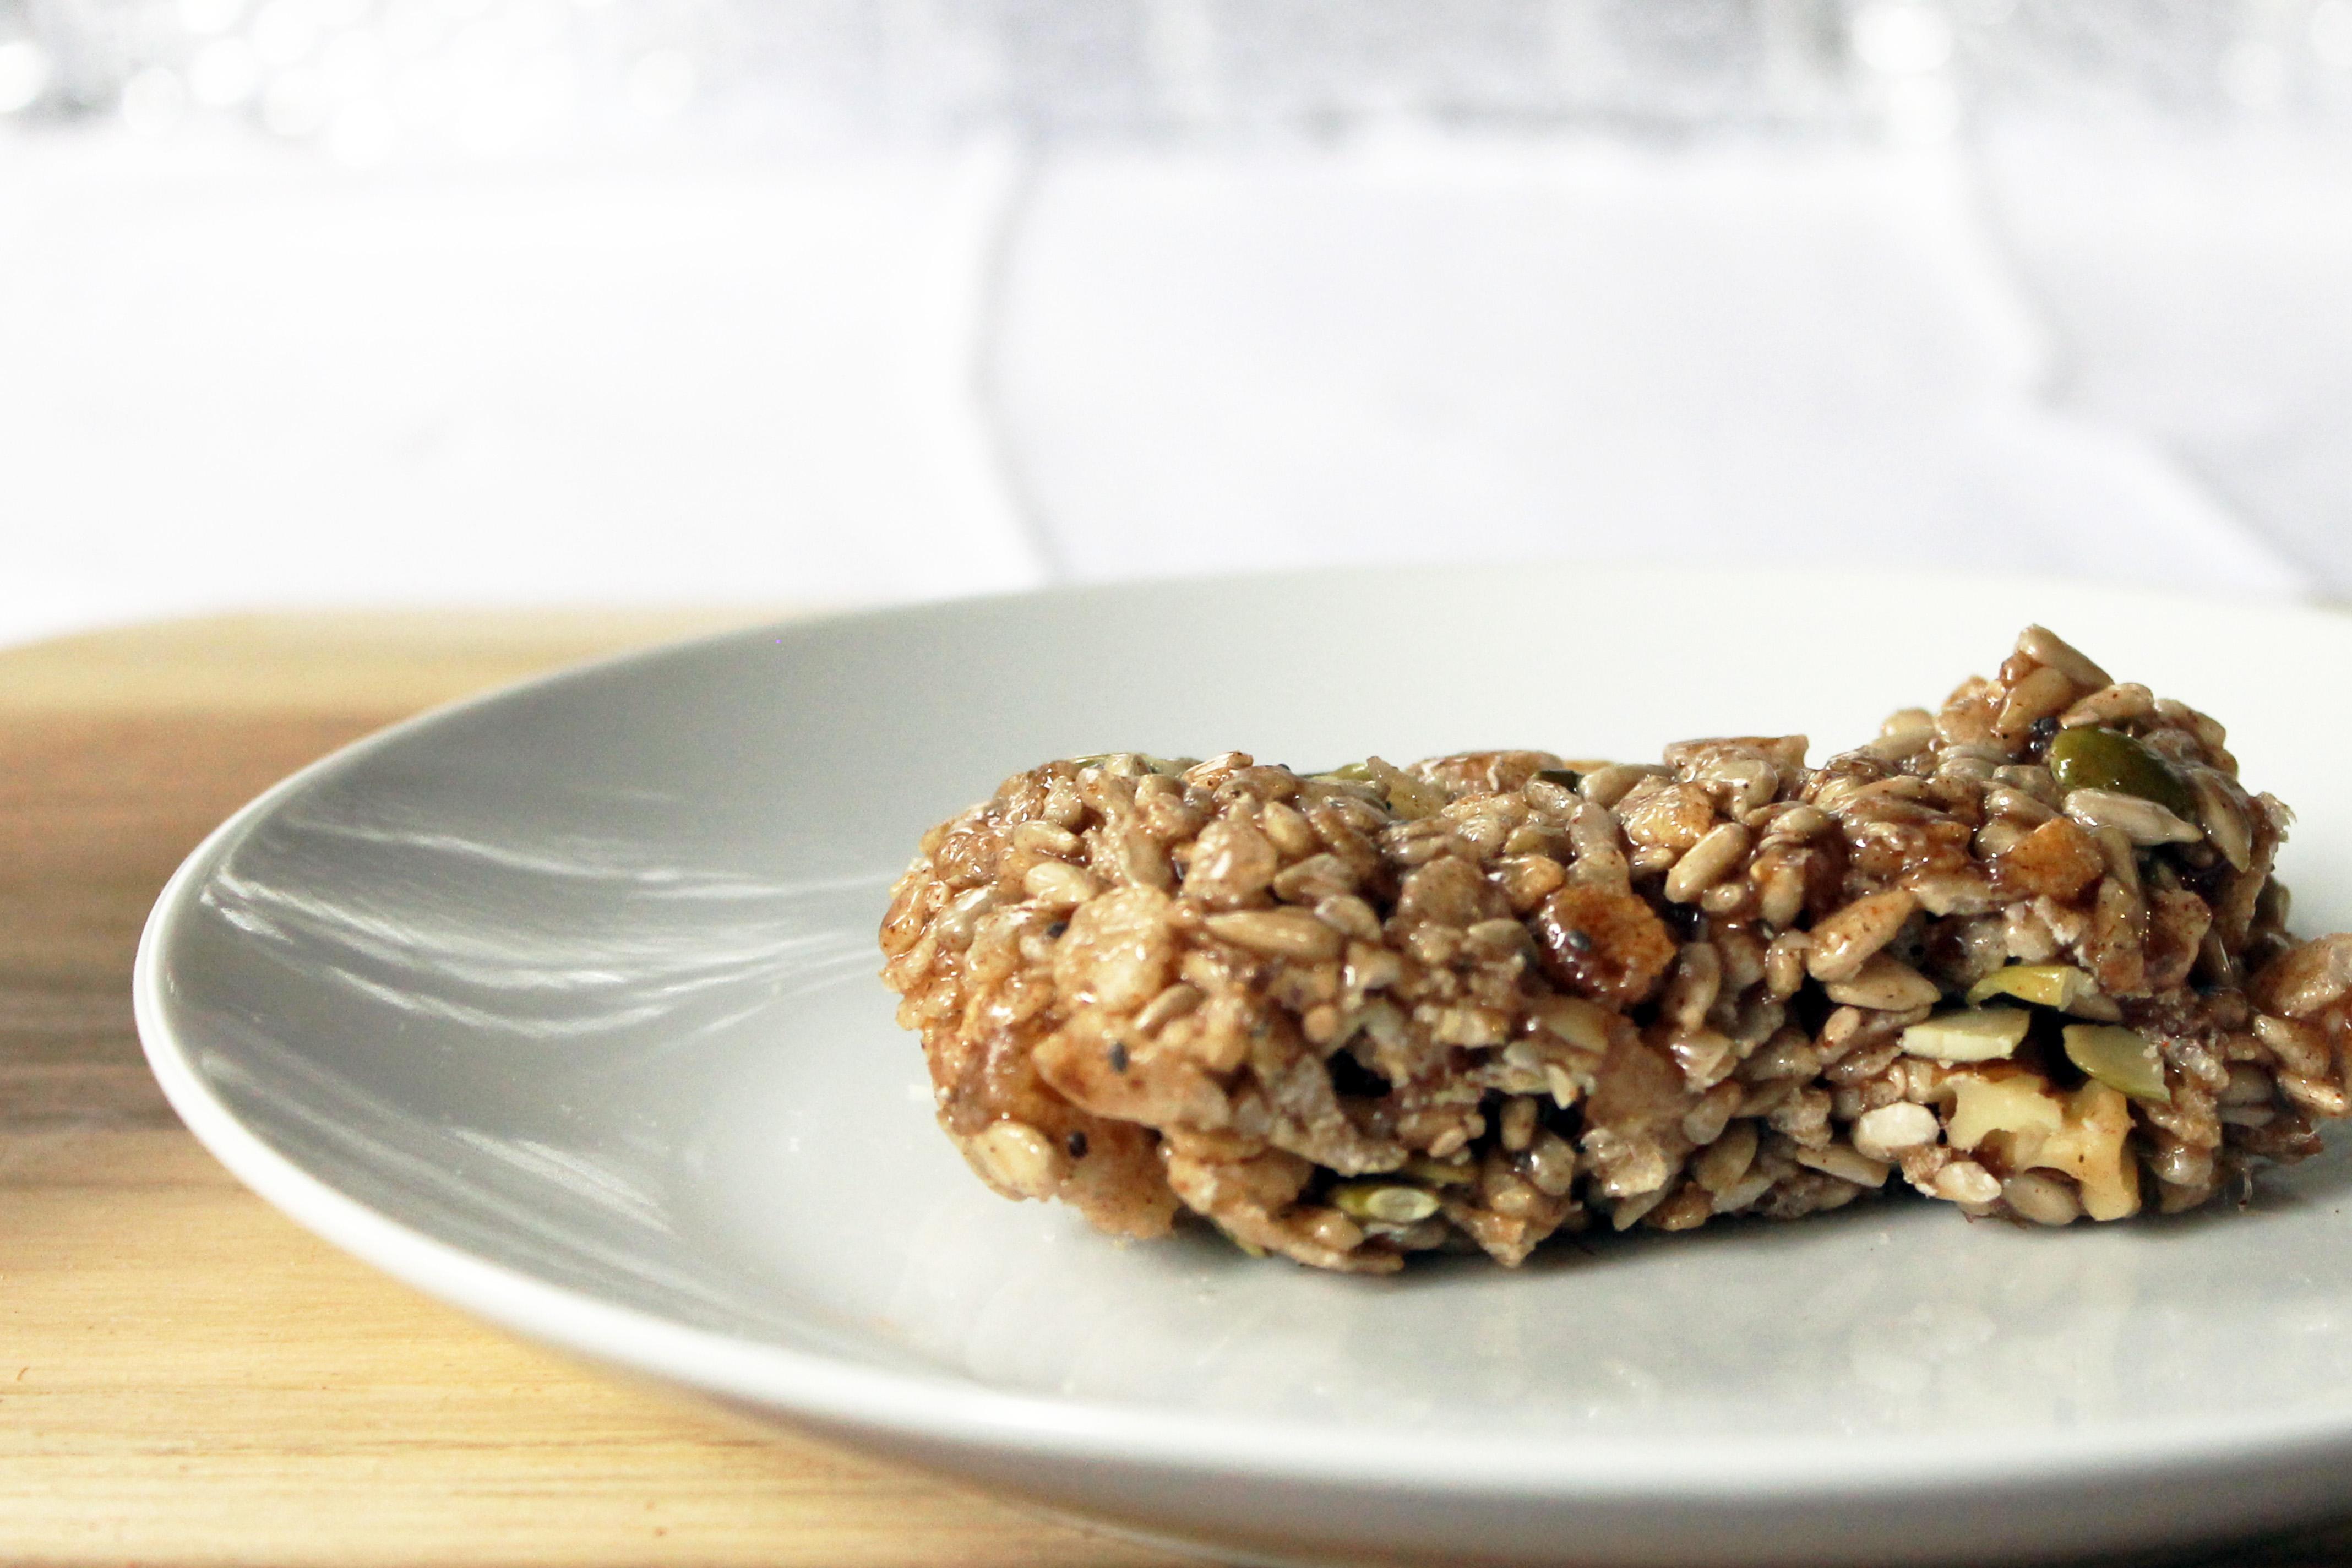 Easy on the go snack!!! Vegan Spiced Nut Bars! #vegan #plantbased #snack #backpacking #recipe #food